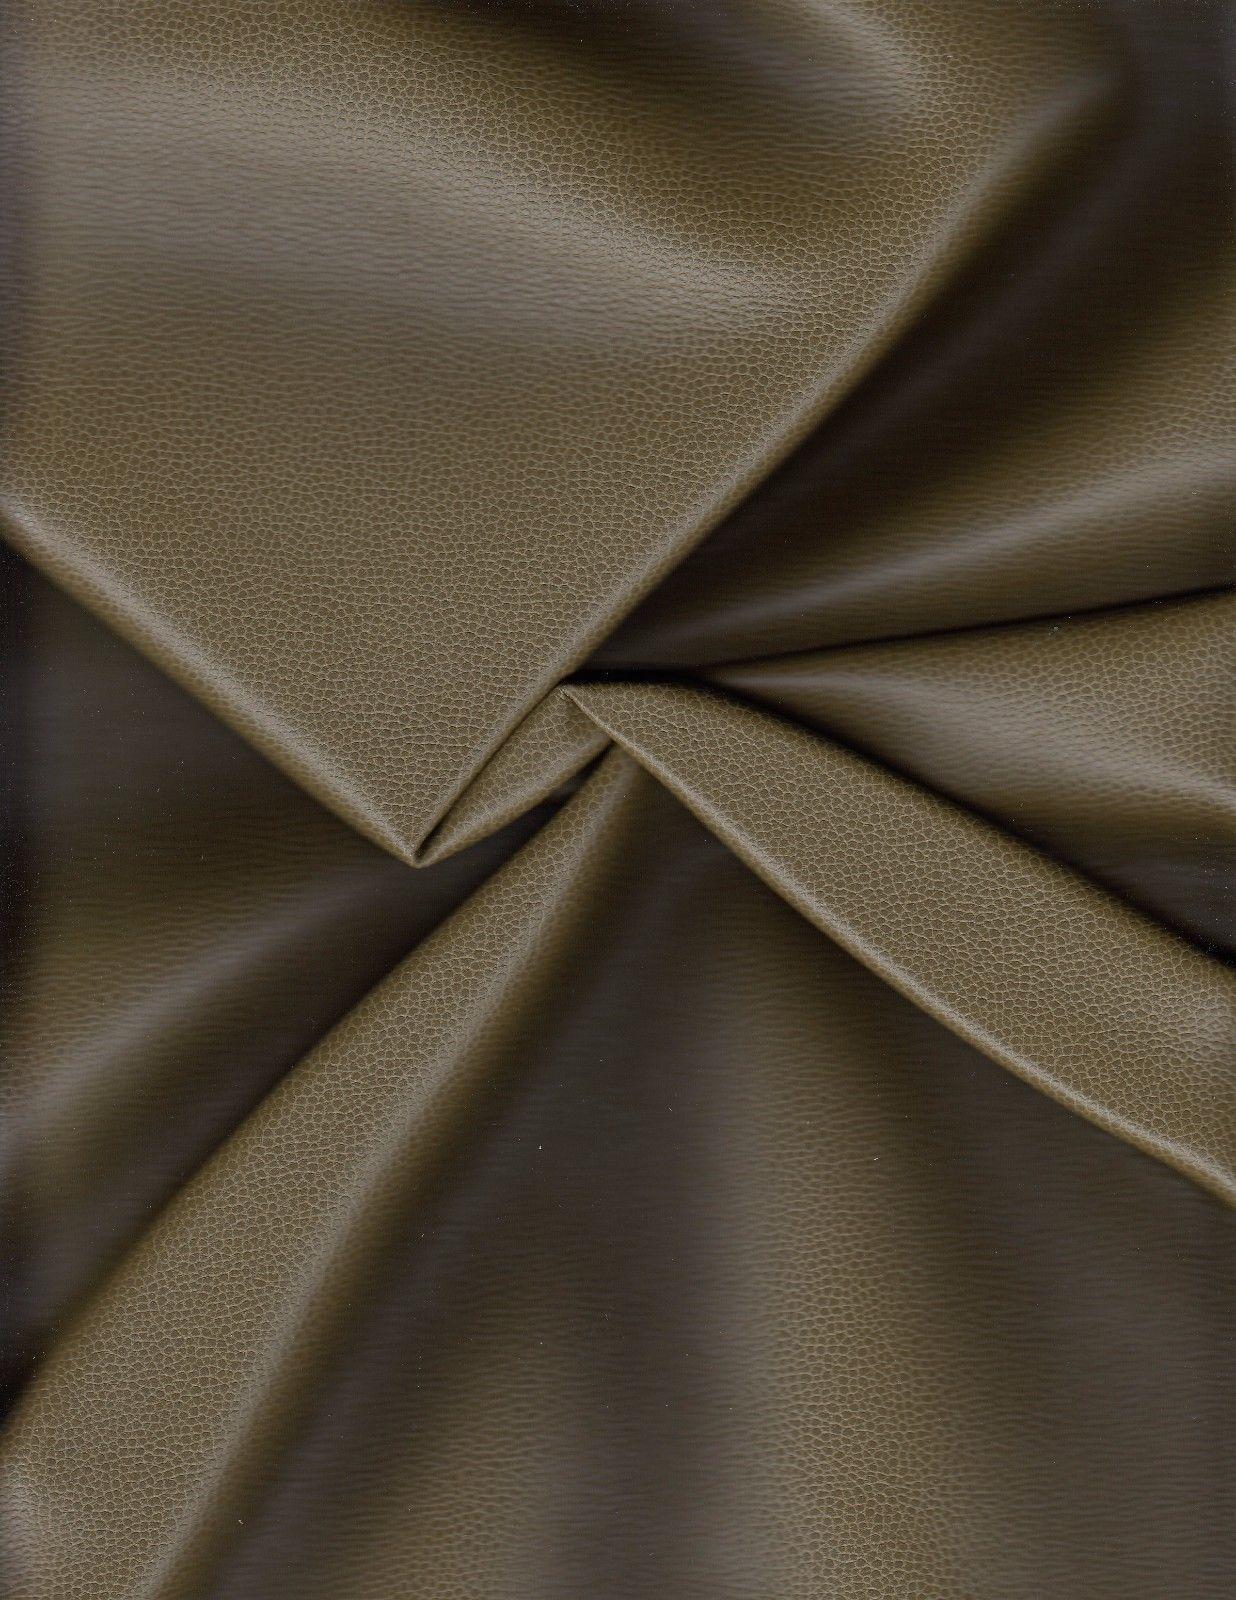 Ultrafabrics Tappezzeria Similpelle 363-4514 Promessa Verde Muschio 5.9m CW2